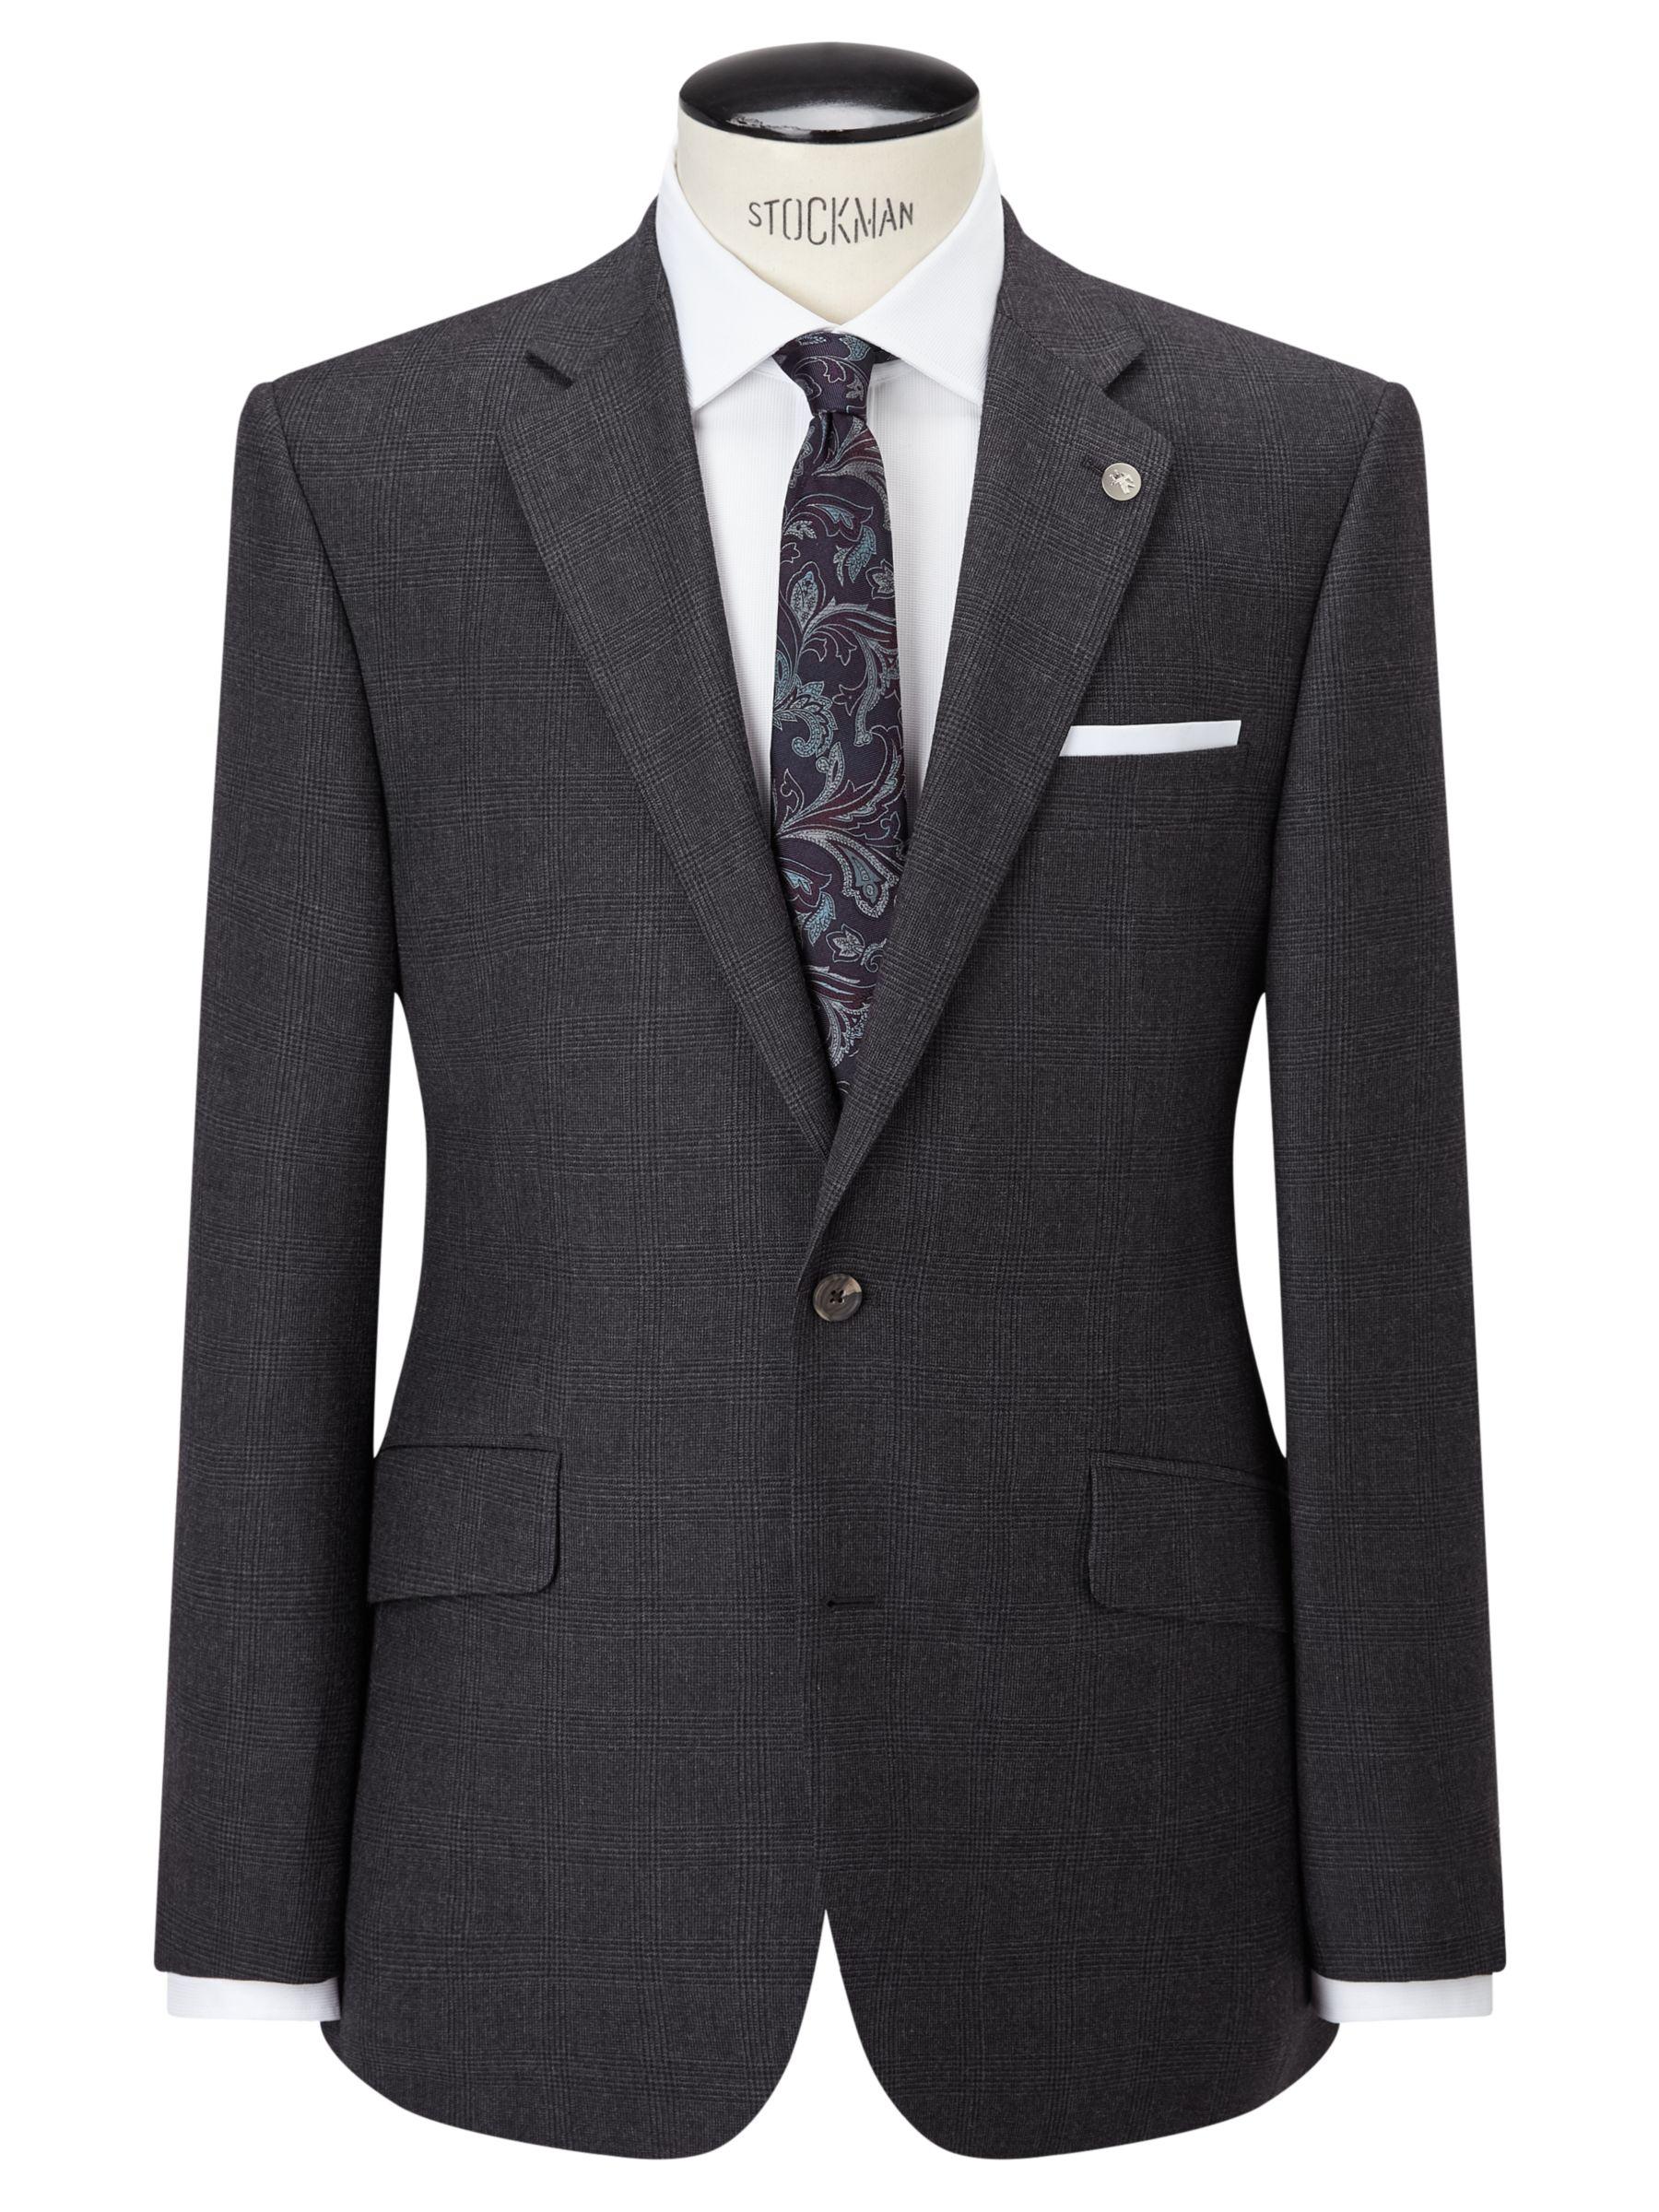 Chester by Chester Barrie Chester by Chester Barrie Glen Check Tailored Suit Jacket, Grey/Blue